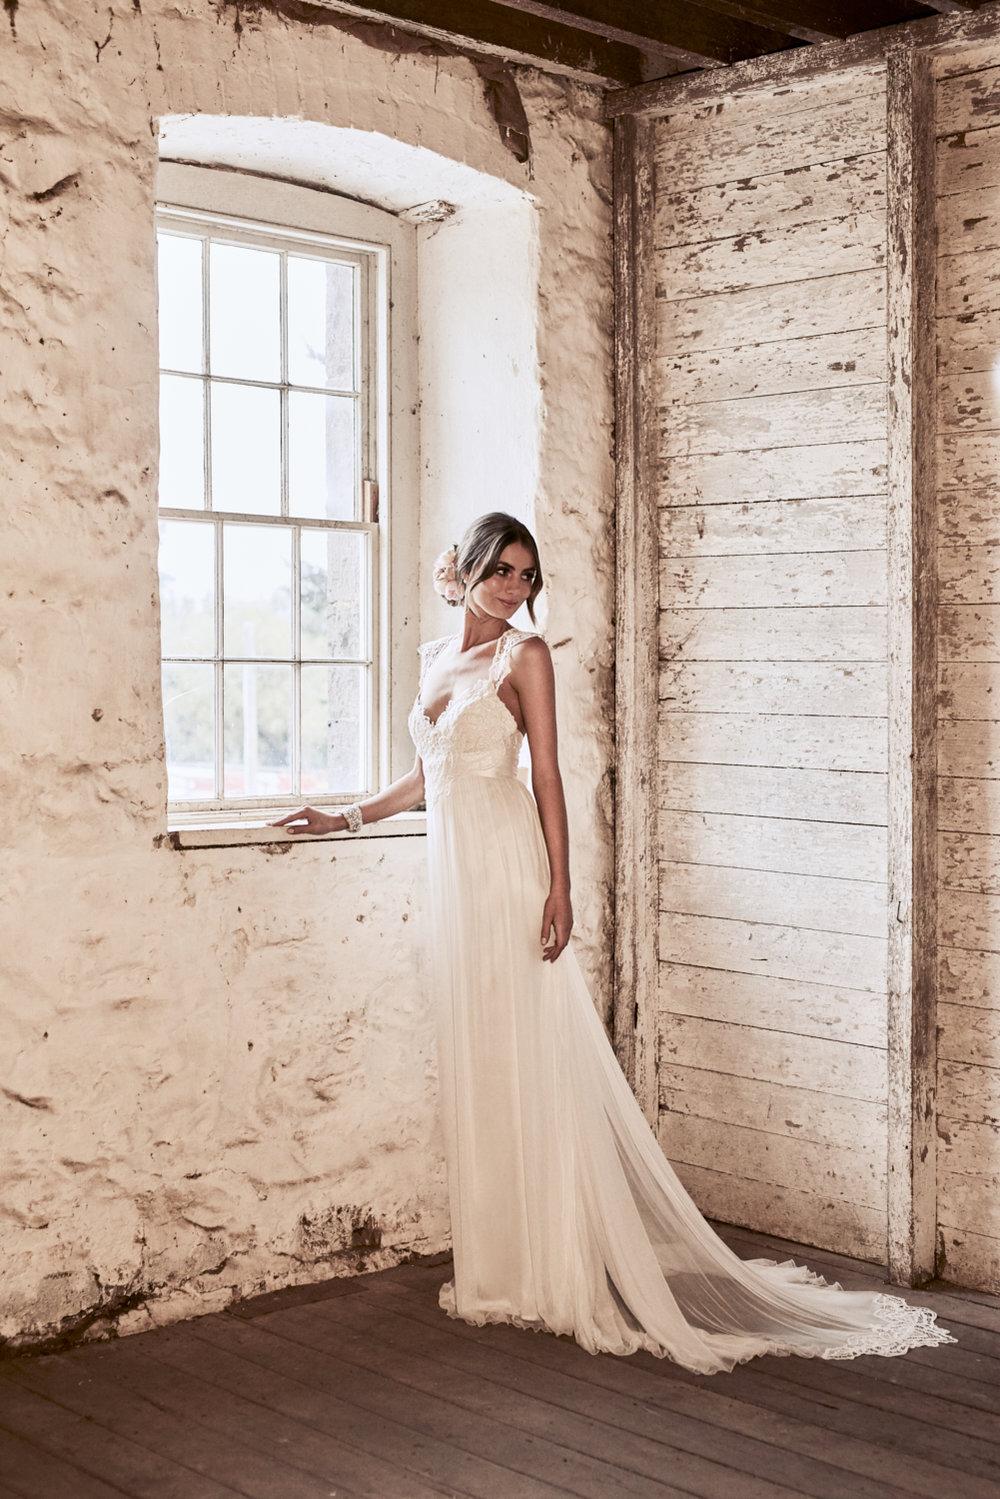 Eleanor-Dress_SilkTulle_Eternal-Heart-Collection-1.jpg